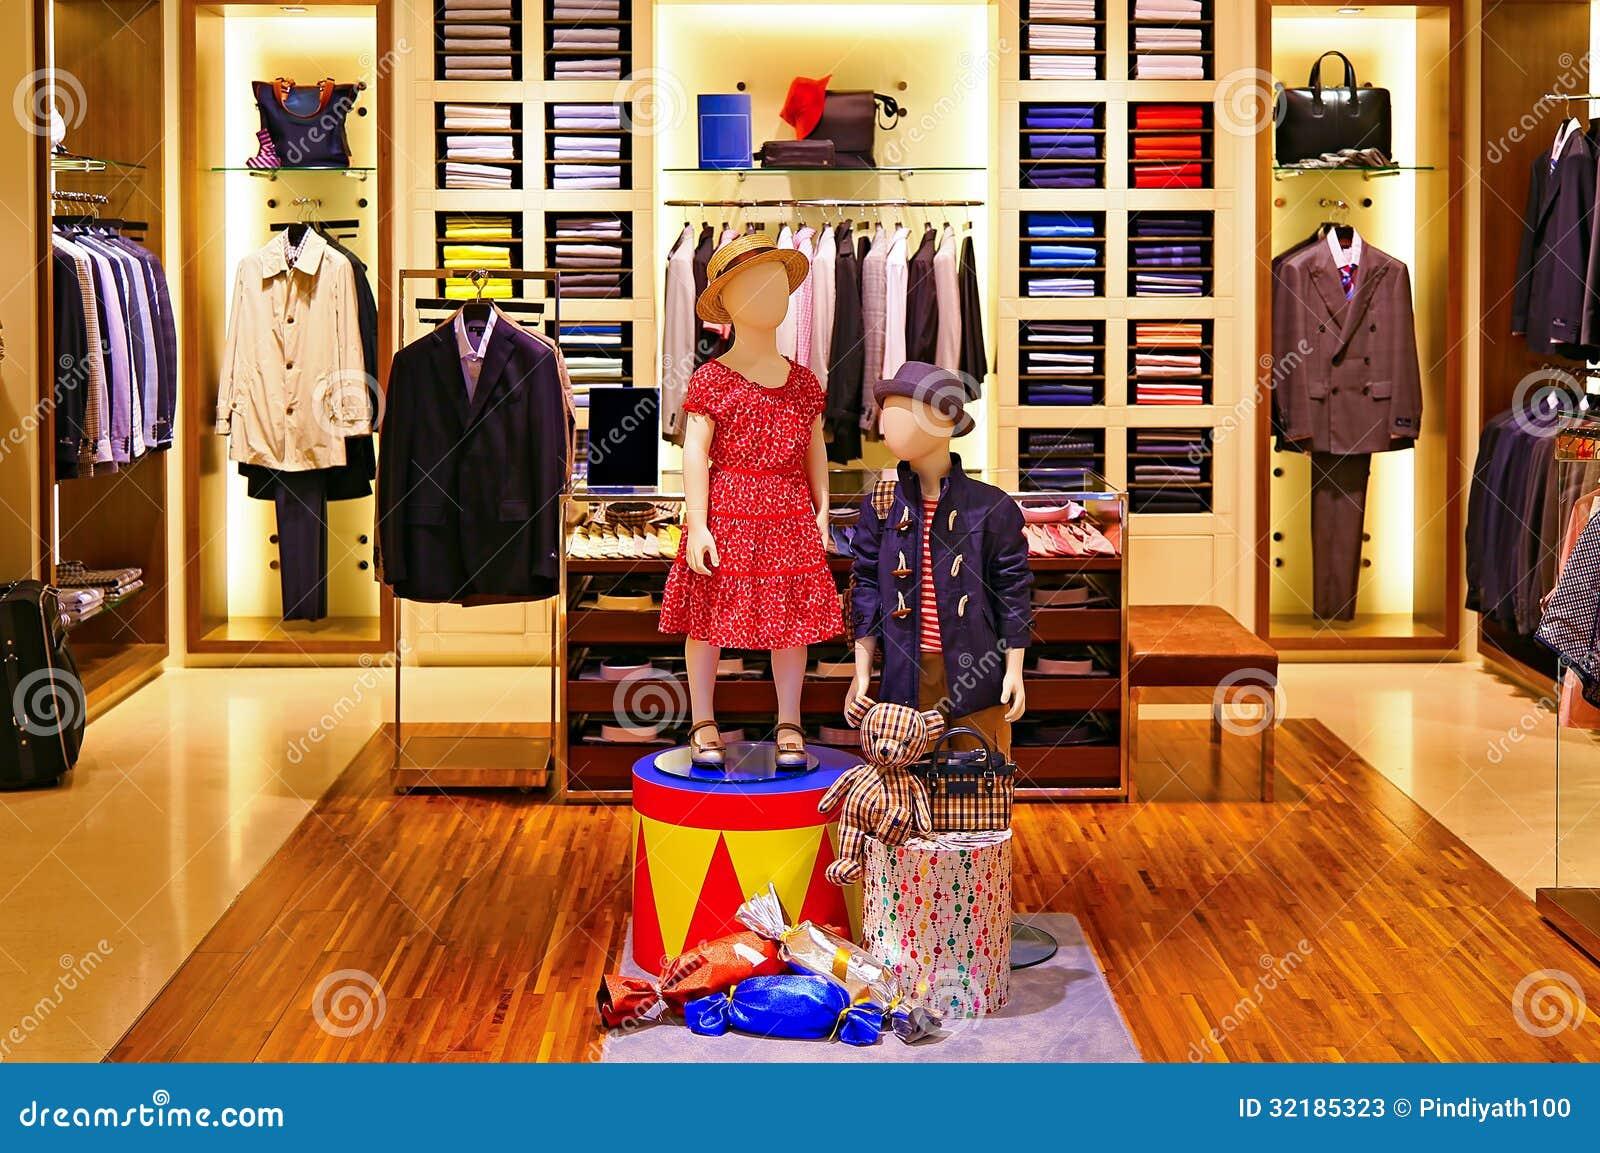 Image Result For Z Racks For Clothing